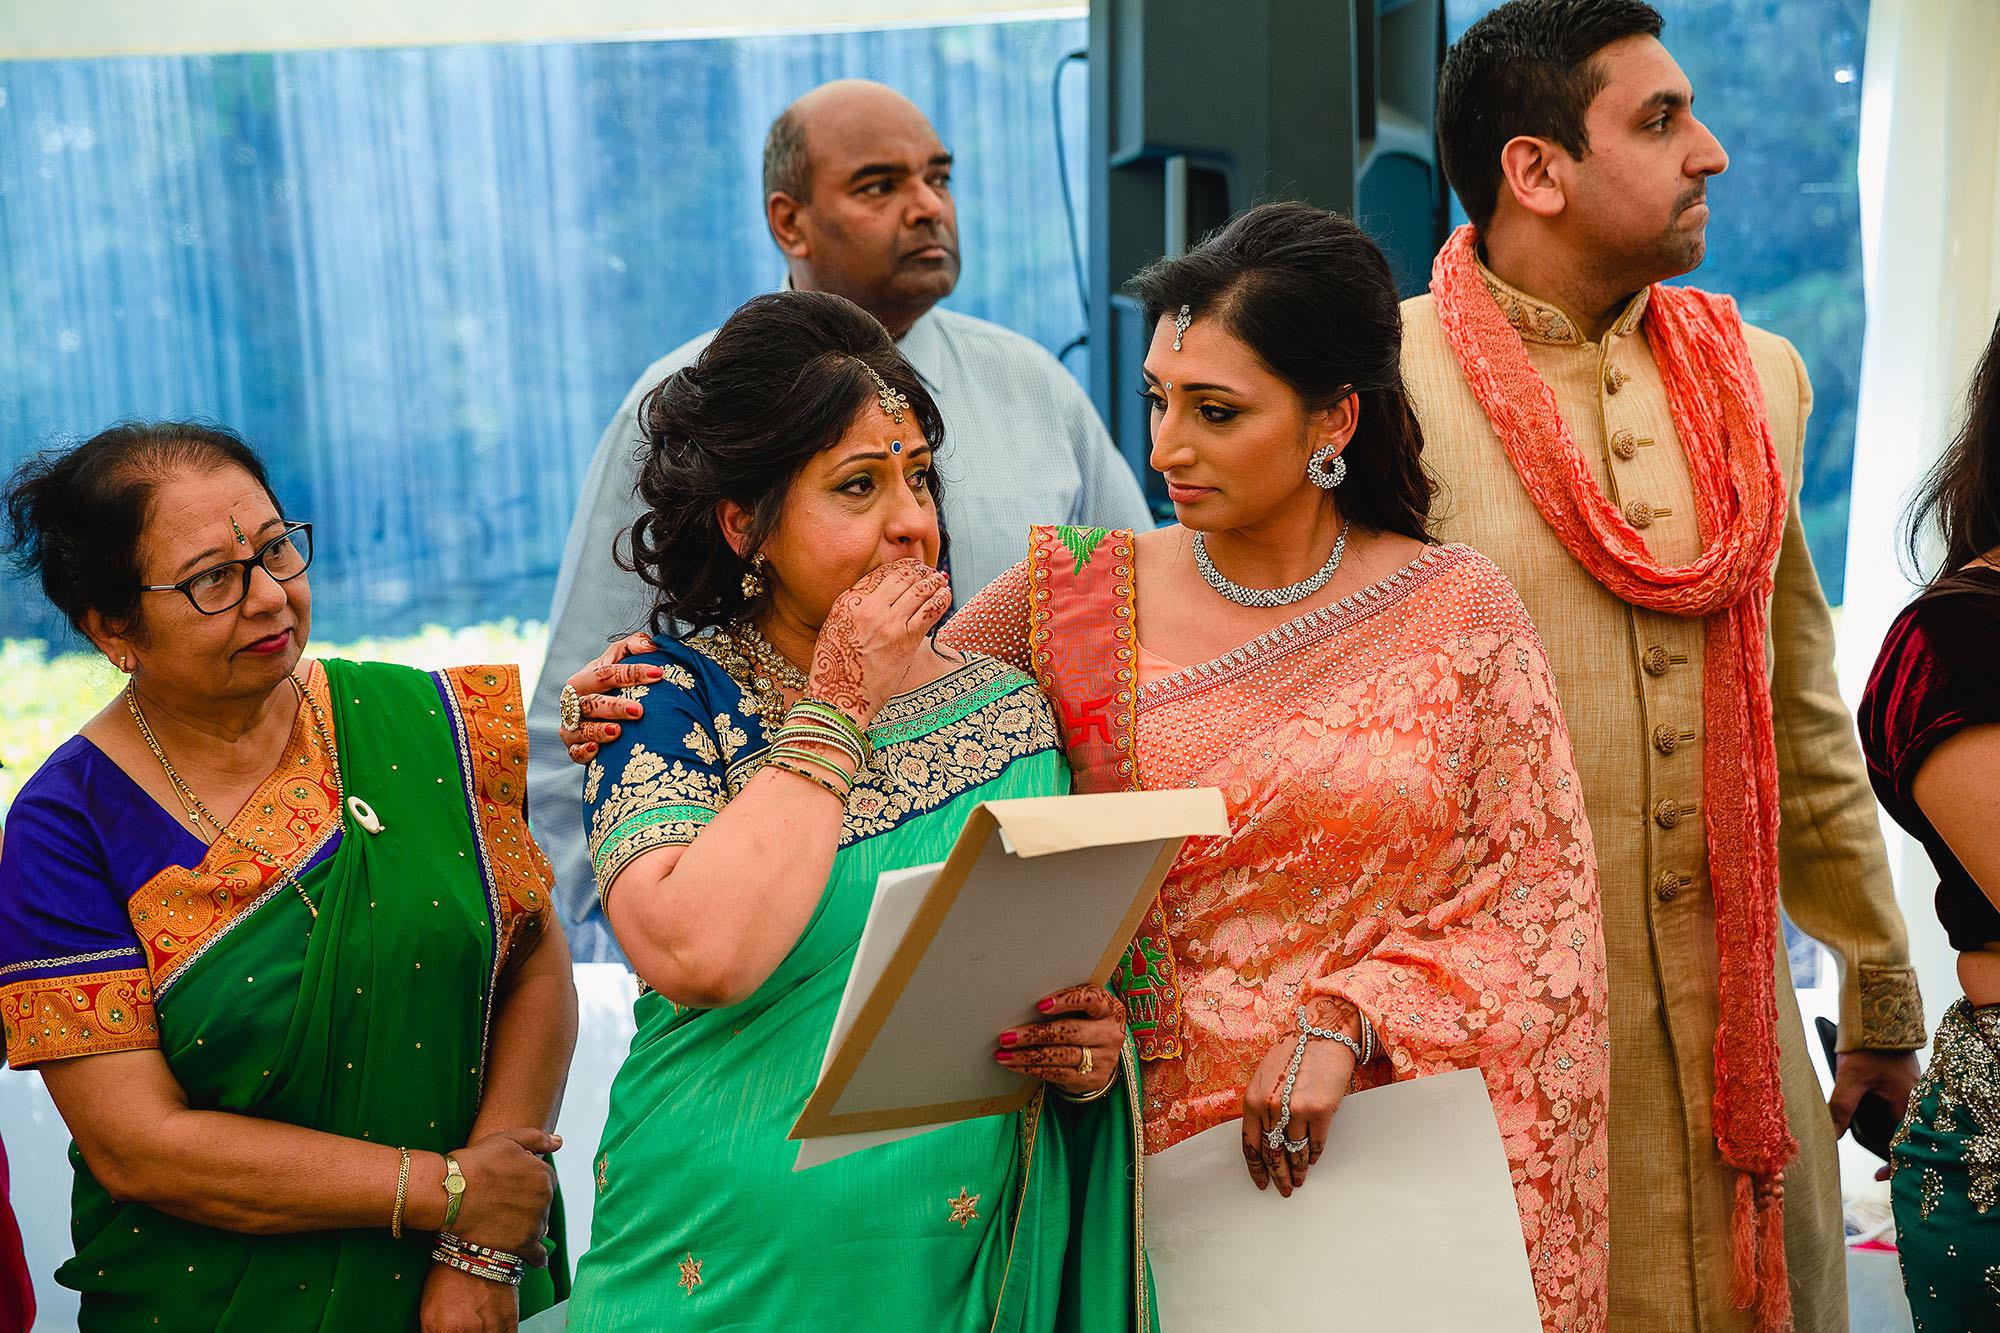 brides mum emotional during bride entrance